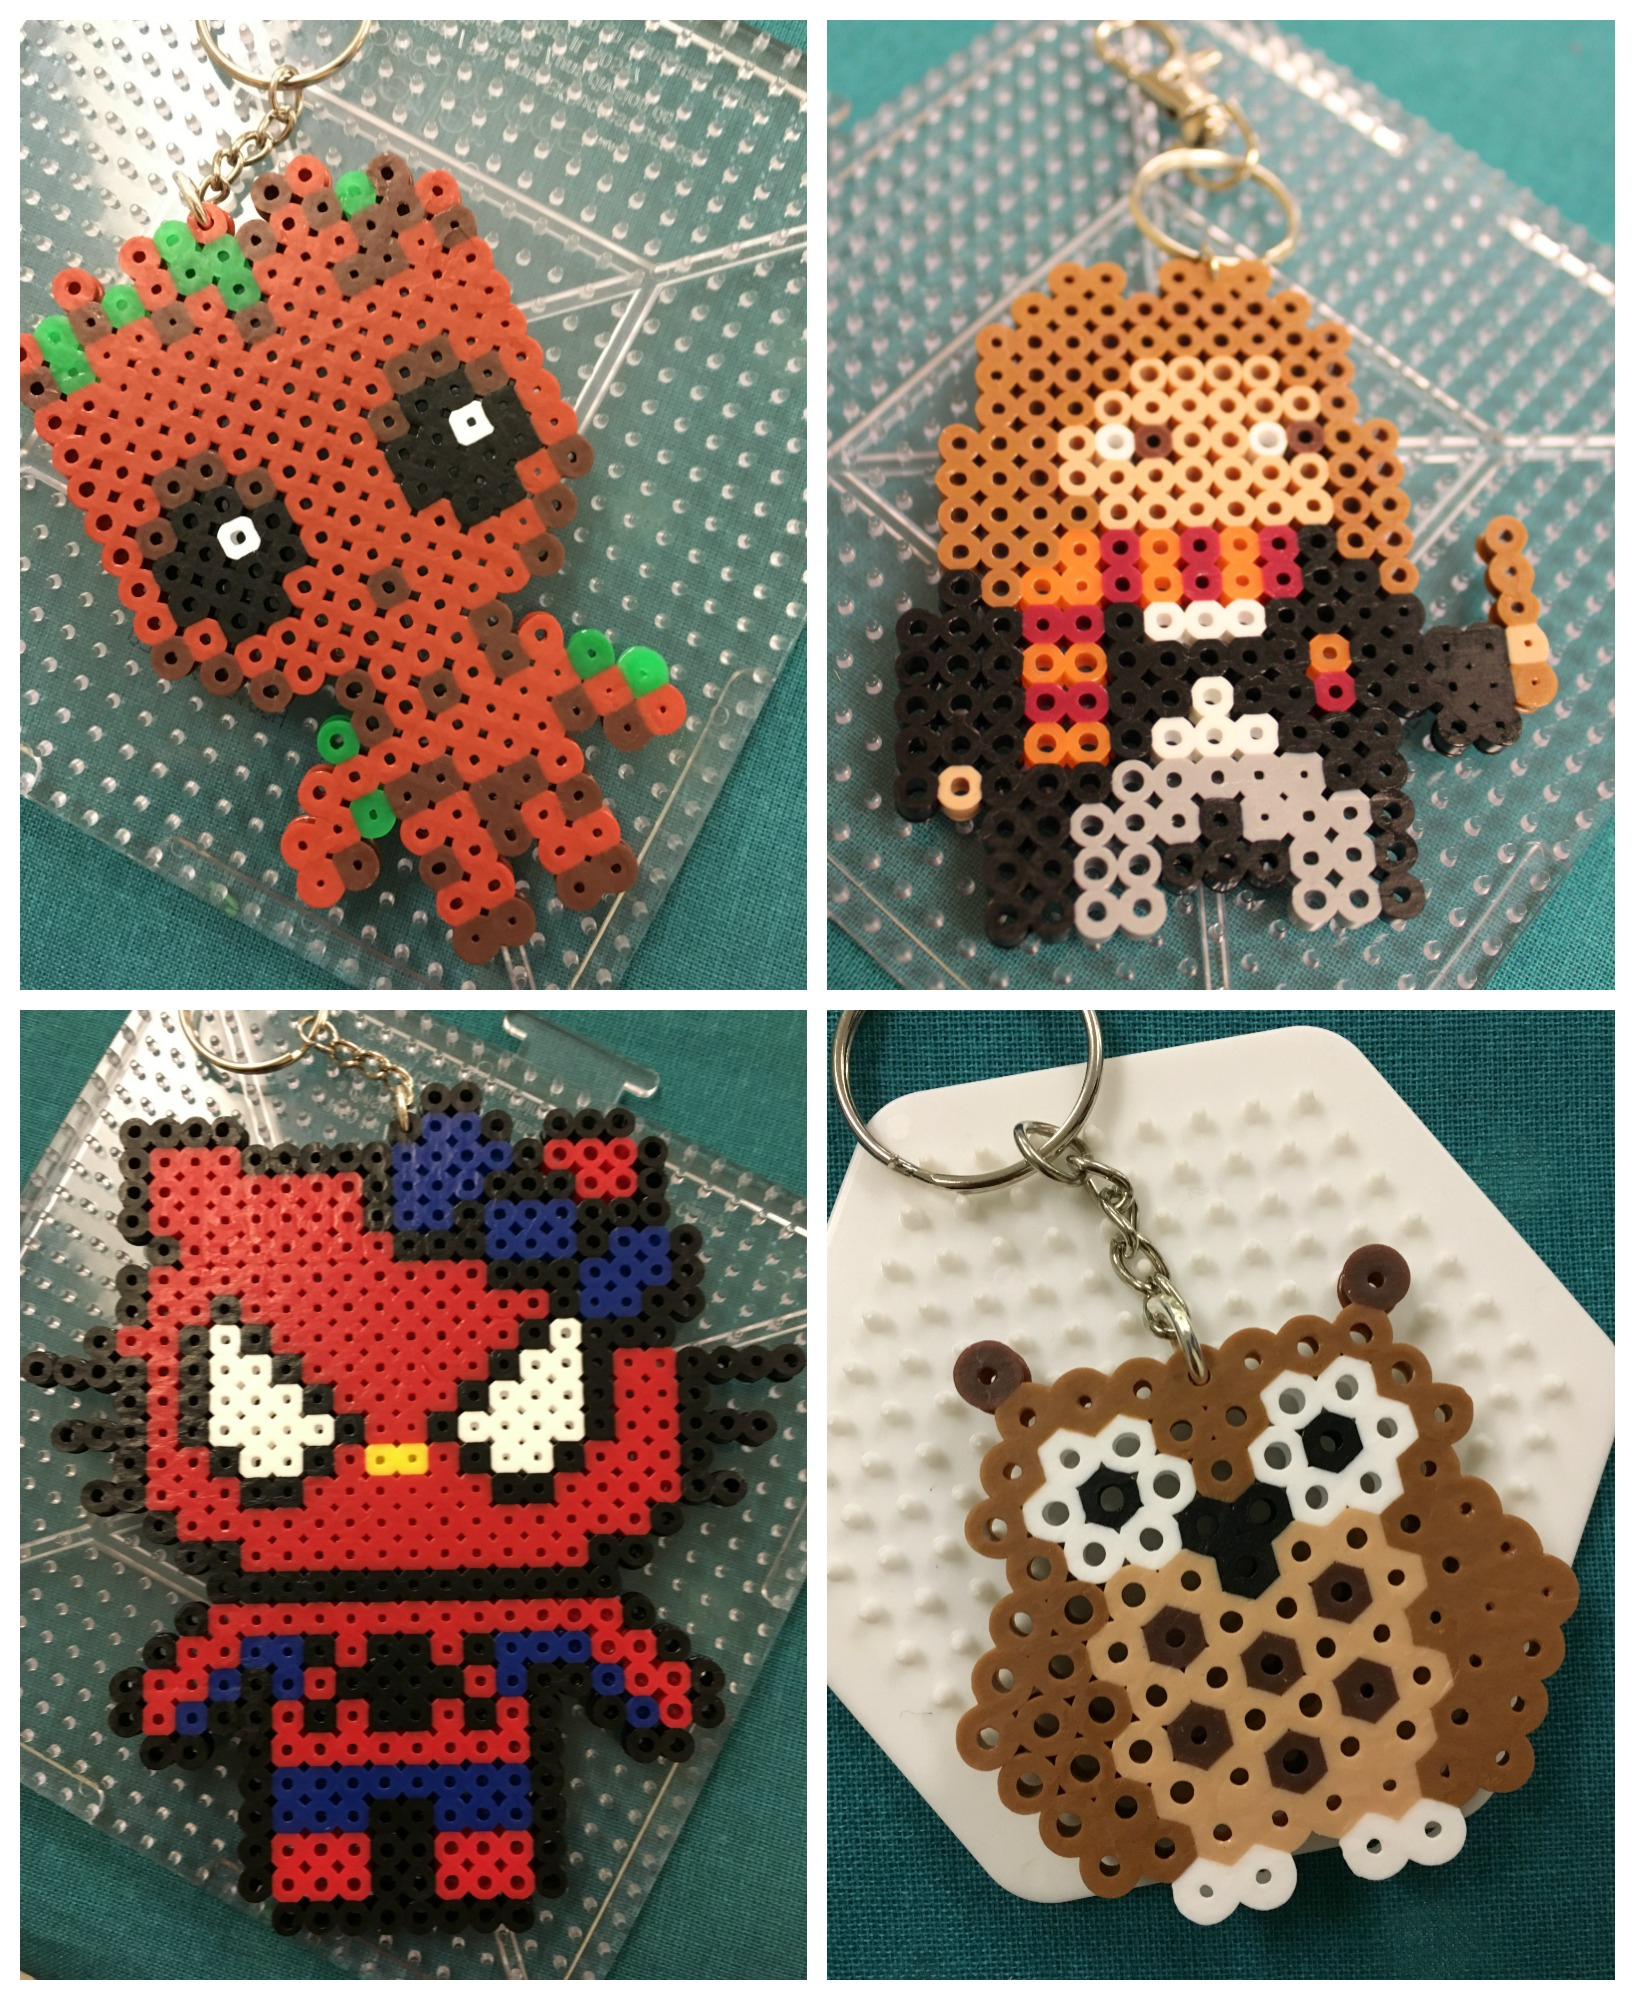 Baby Groot key chain, Hermoine key chain, owl key chain, and Hello Kitty-Spider-Man key chain